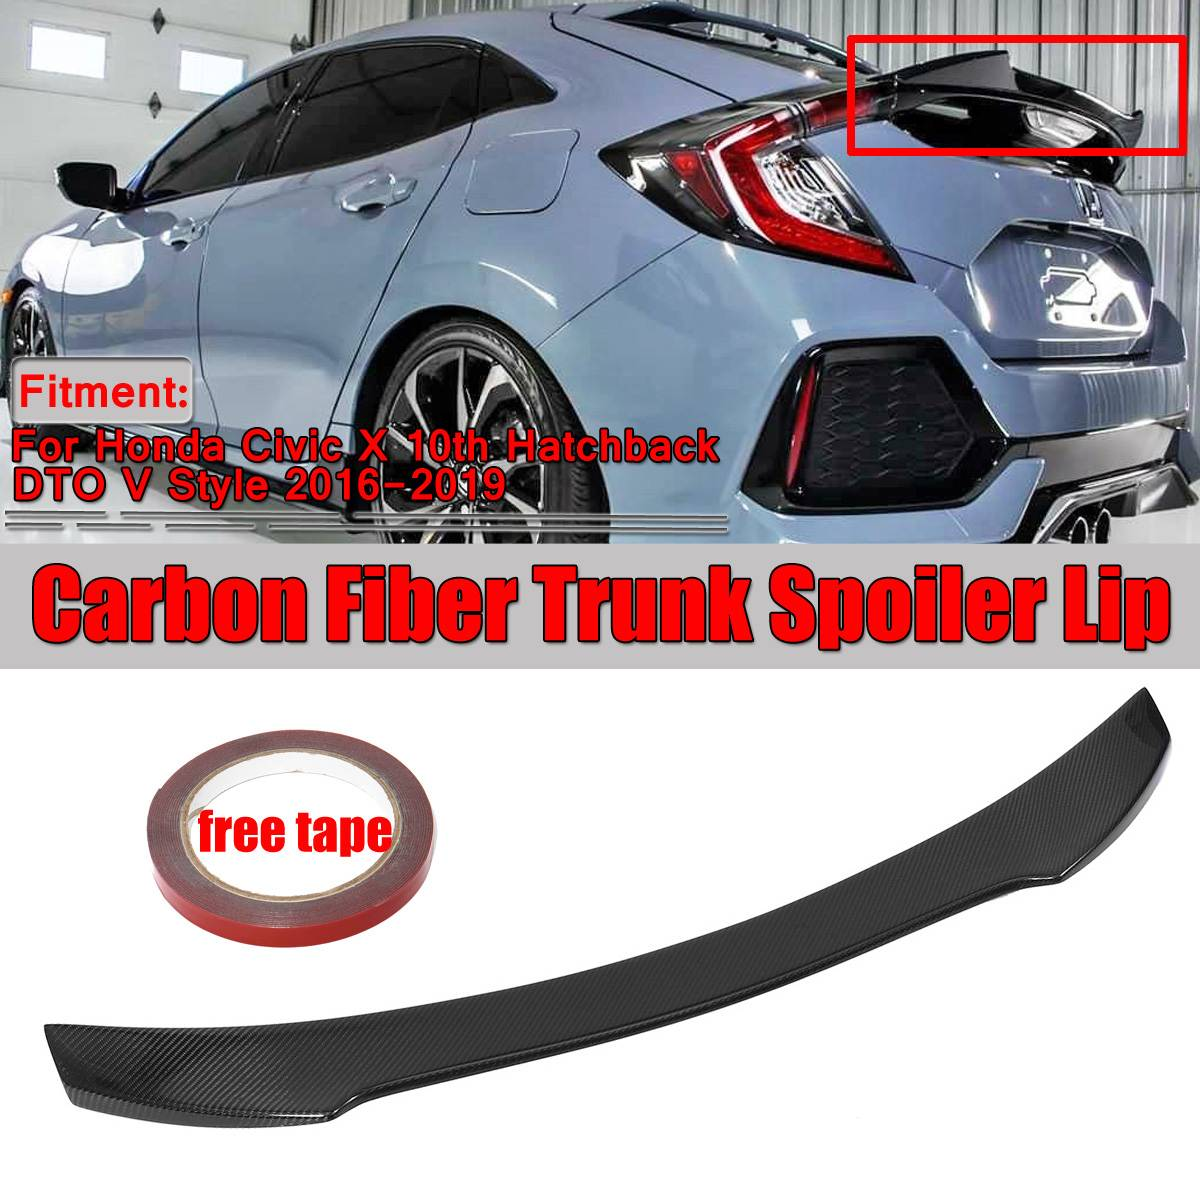 1xReal Carbon Fiber Car Trunk Rear Roof Spoiler Wing Lip For Honda For Civic X 10th Hatchback DTO V Style 2016-2019 Wing Sopiler